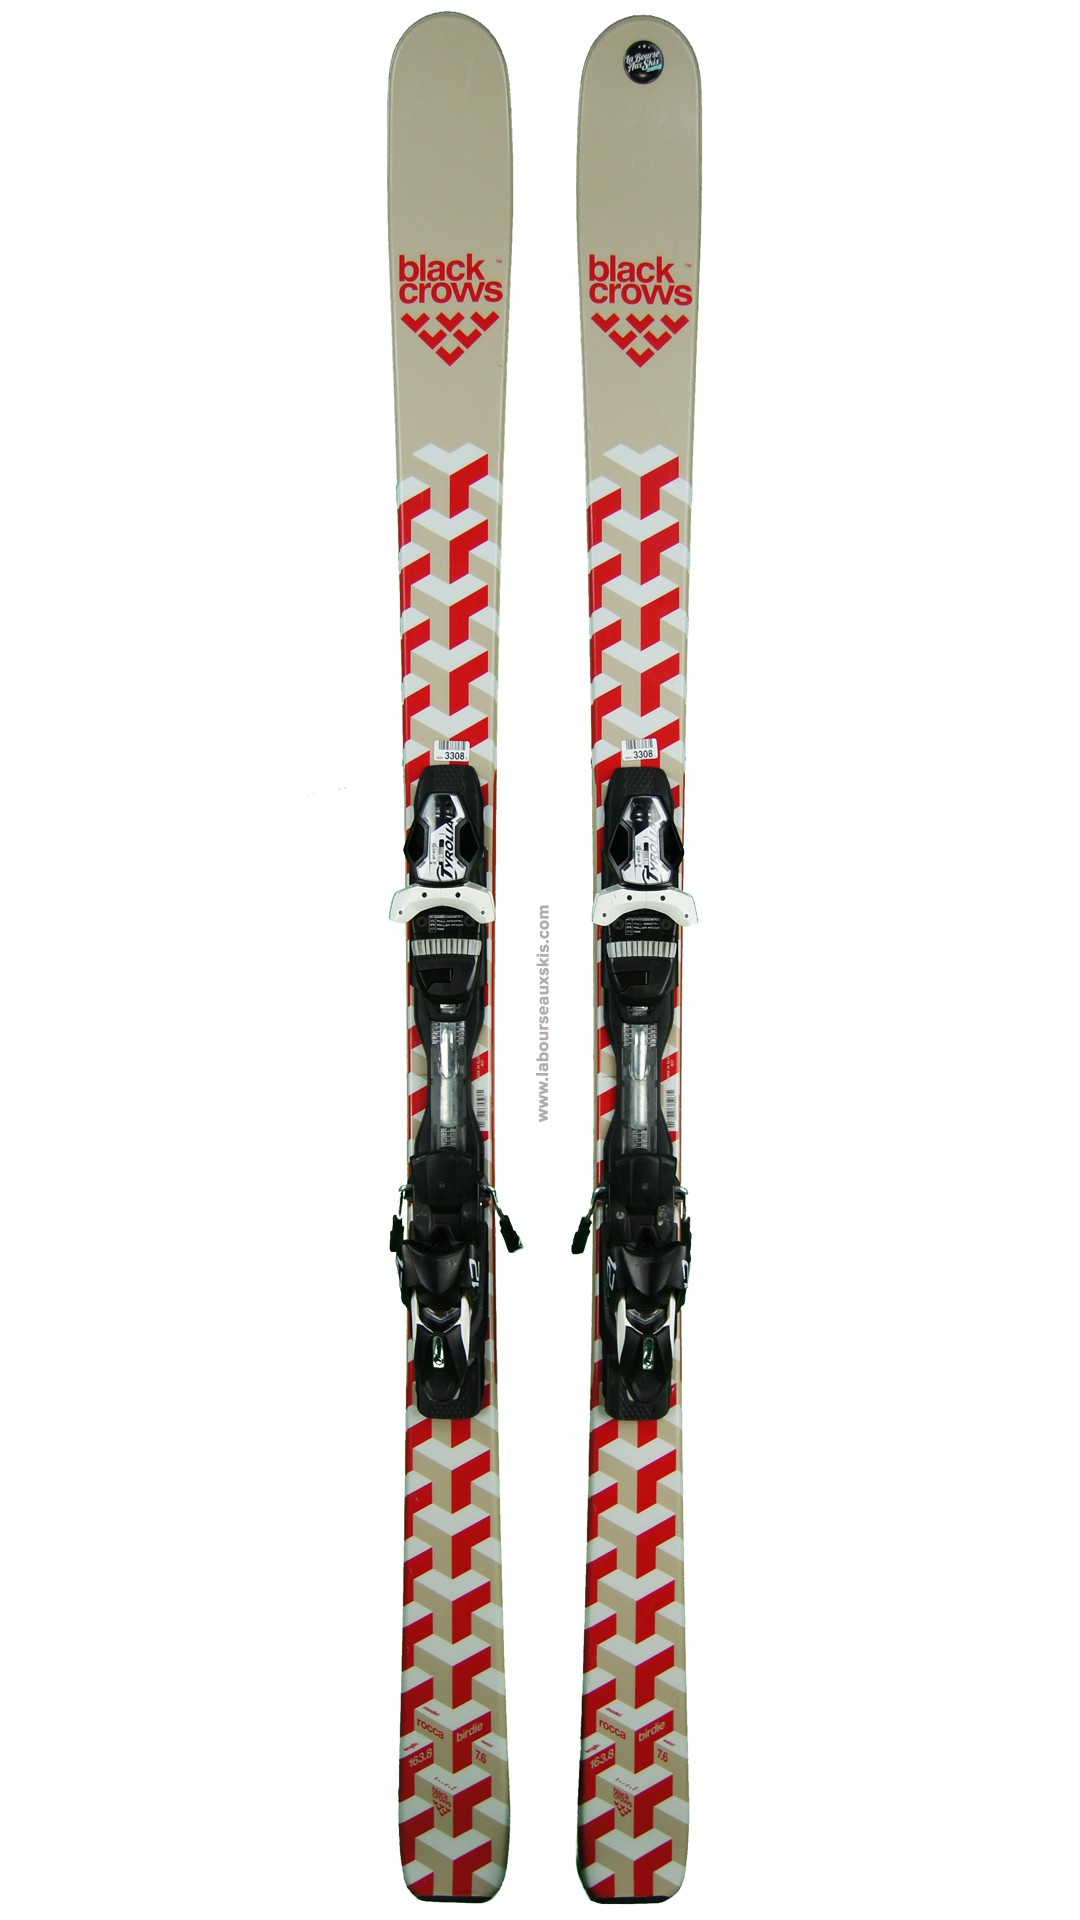 ski occasion black crows rocca birdie skis d 39 occasion laboursea. Black Bedroom Furniture Sets. Home Design Ideas